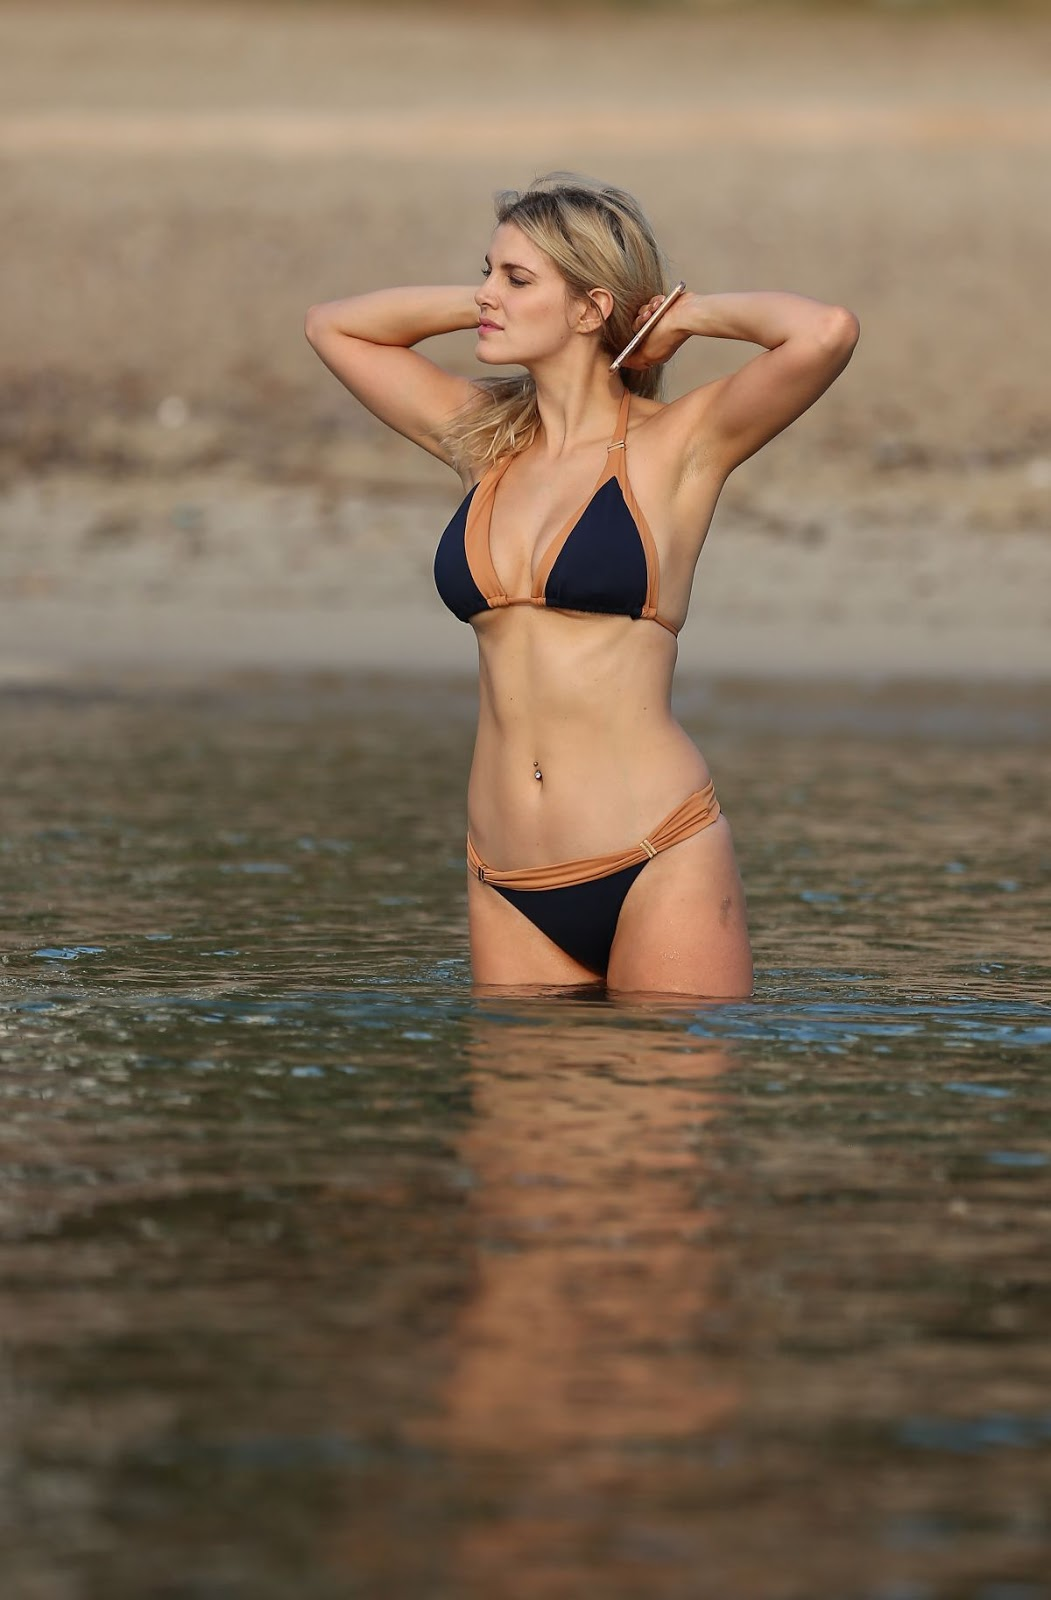 Ashley James in Bikini 2016